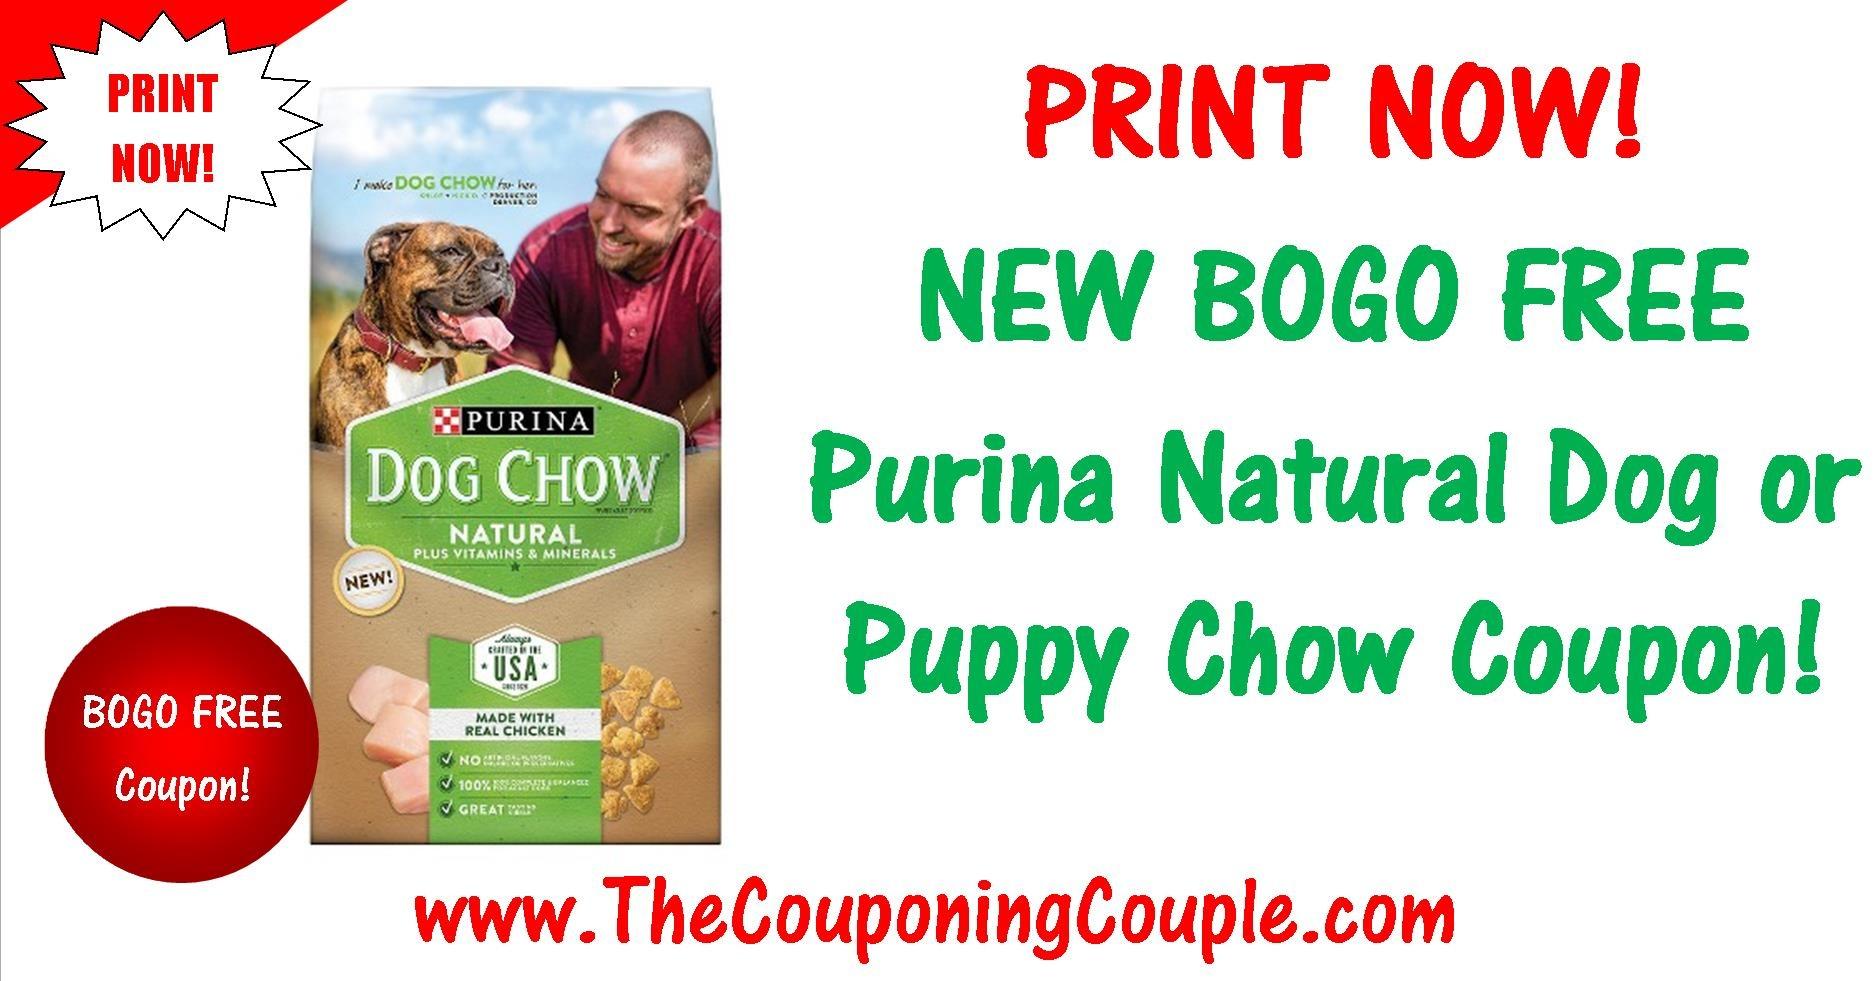 New Bogo Free Purina Natural Printable Coupon ~ Print Now! - Free Printable Coupons For Purina One Dog Food